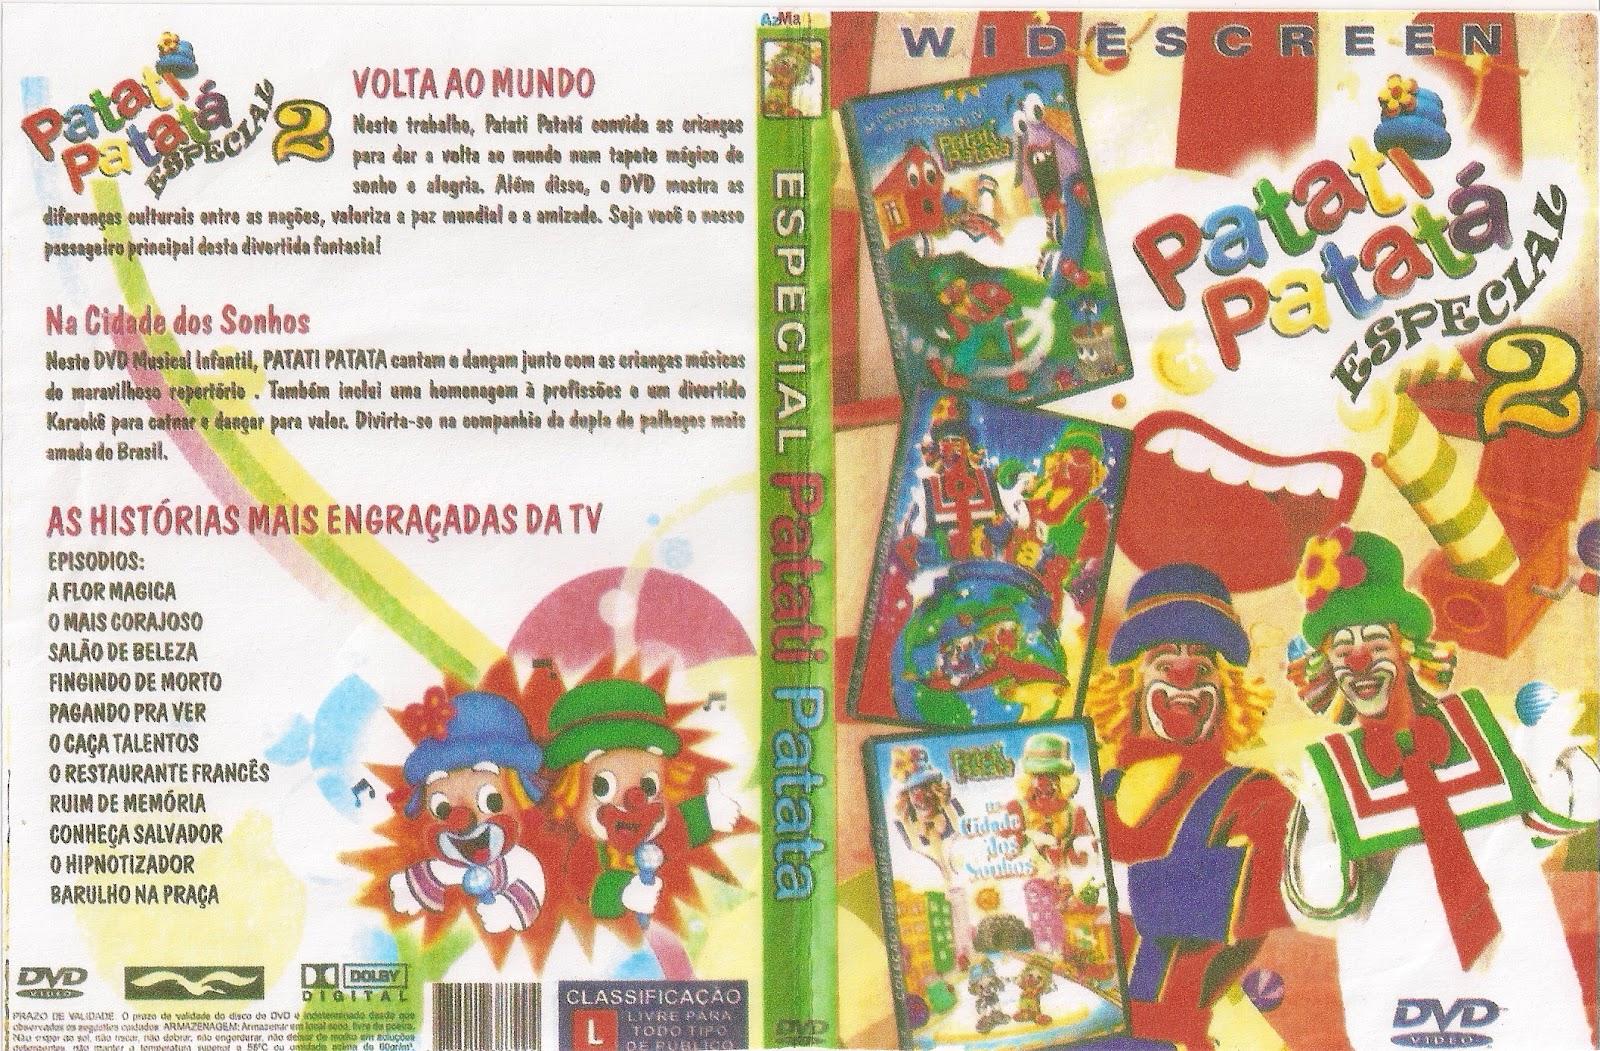 PATATI PATATA   3 EM 1 VOLUME 2